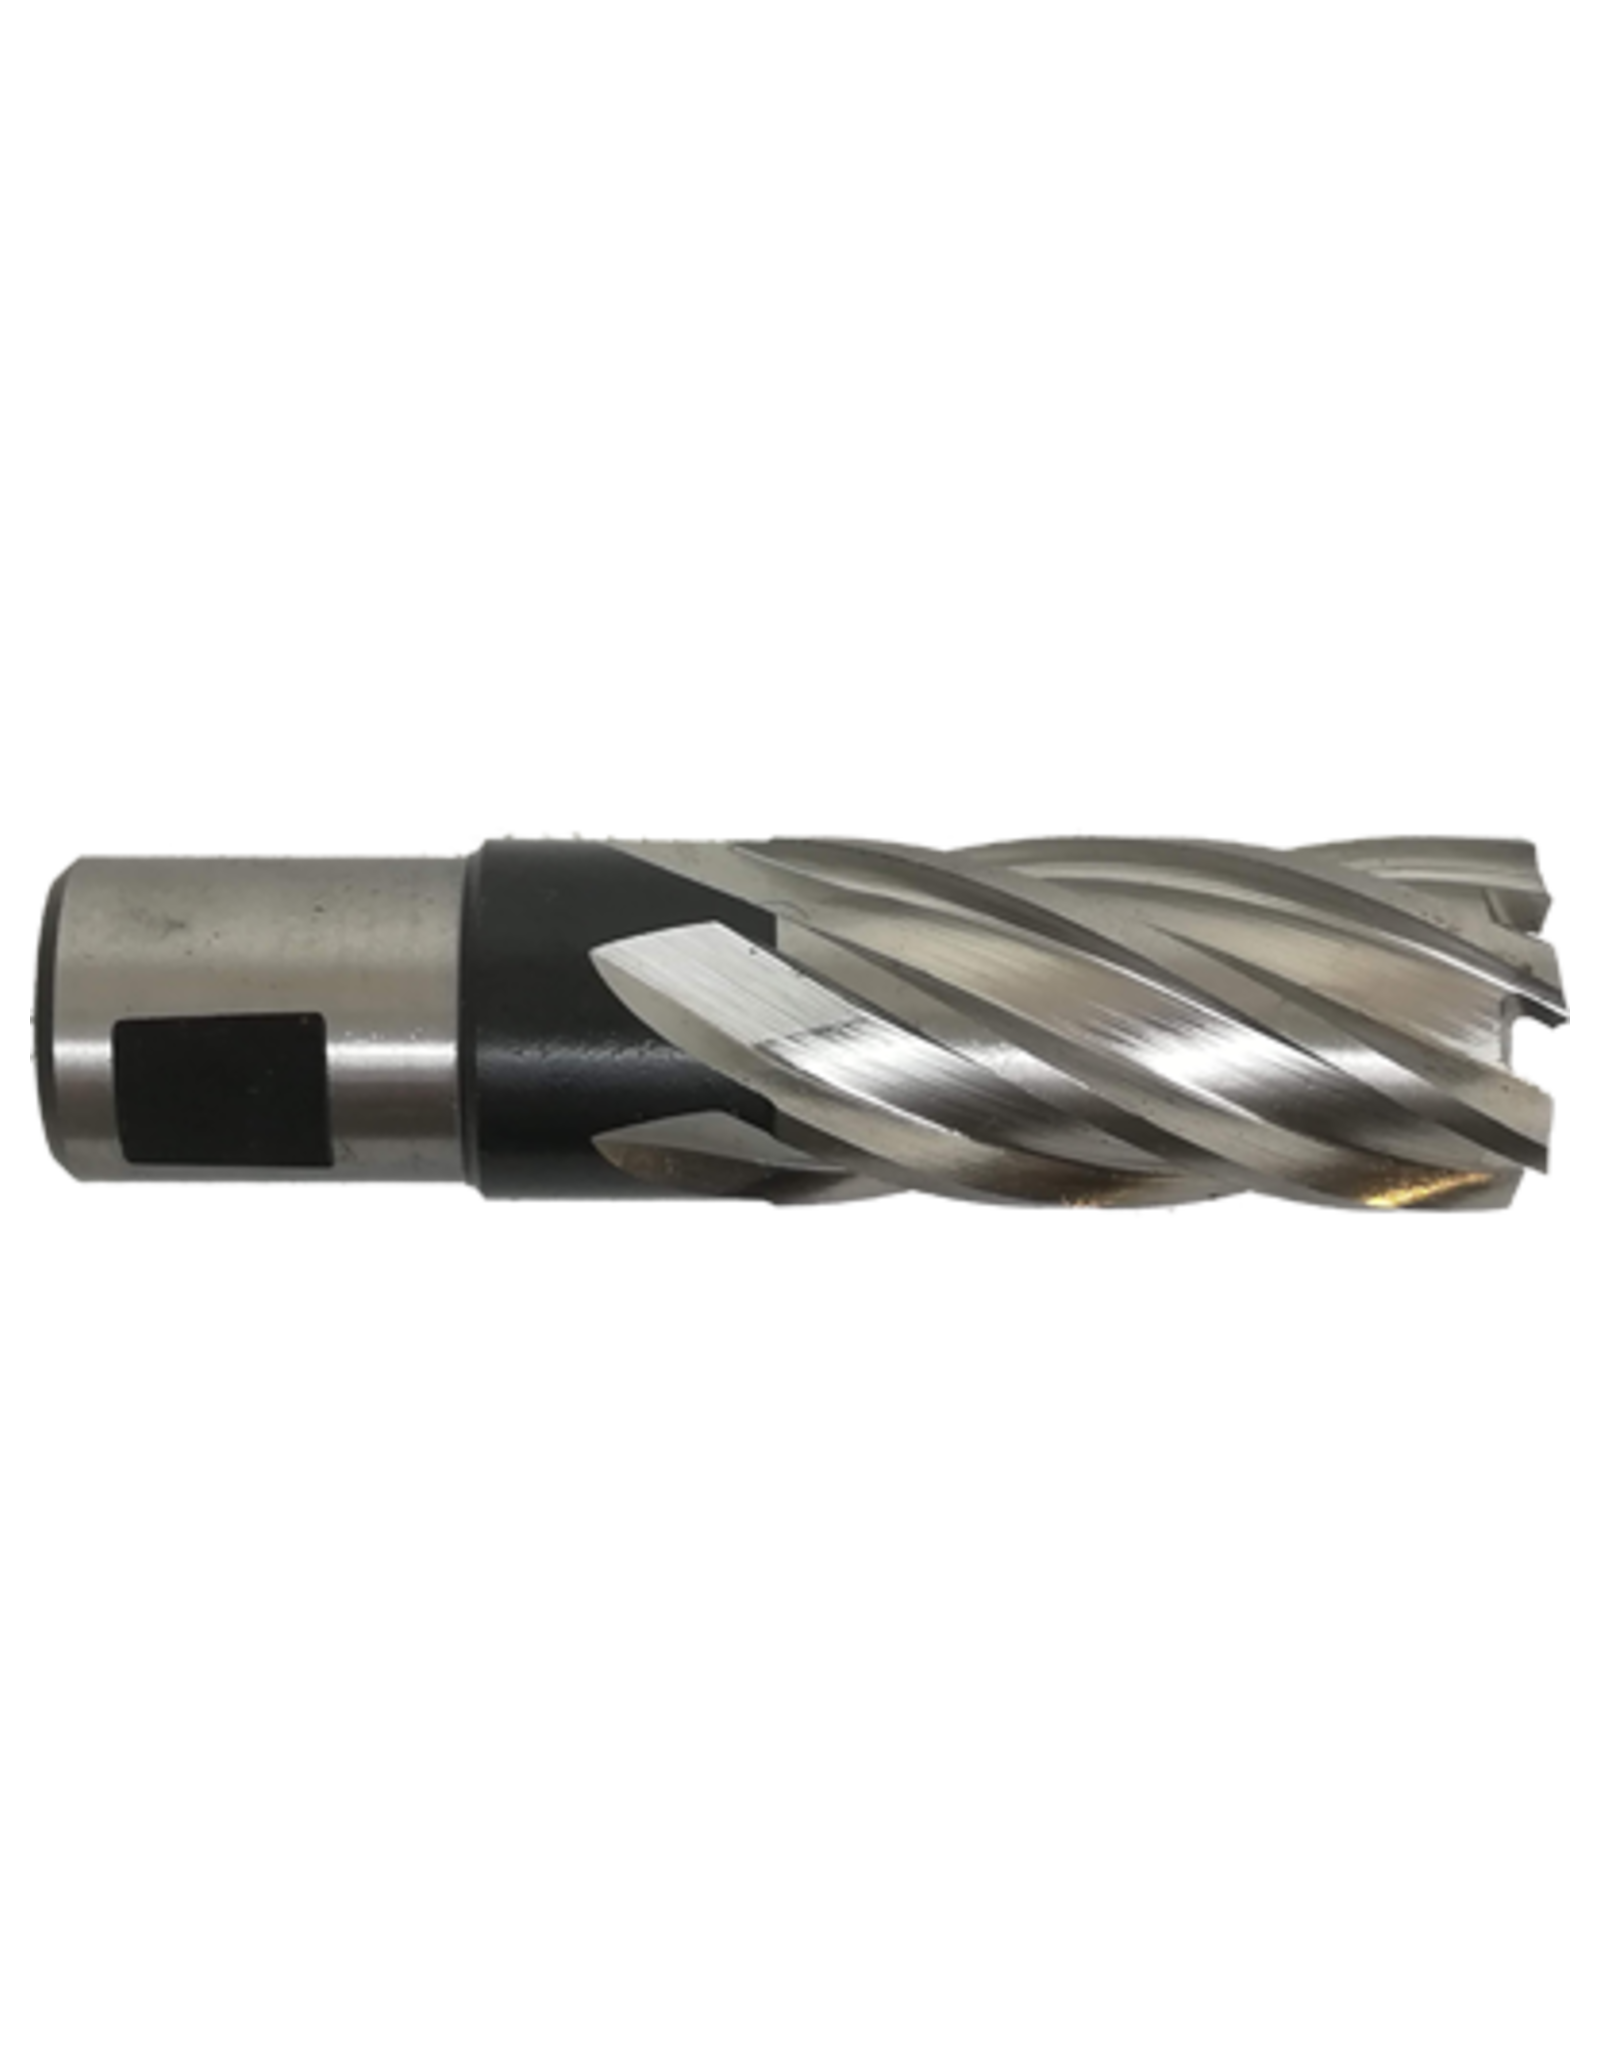 Evolution Power Tools Steel Line EVOLUTION CORE CUTTER LONG - 29 MM